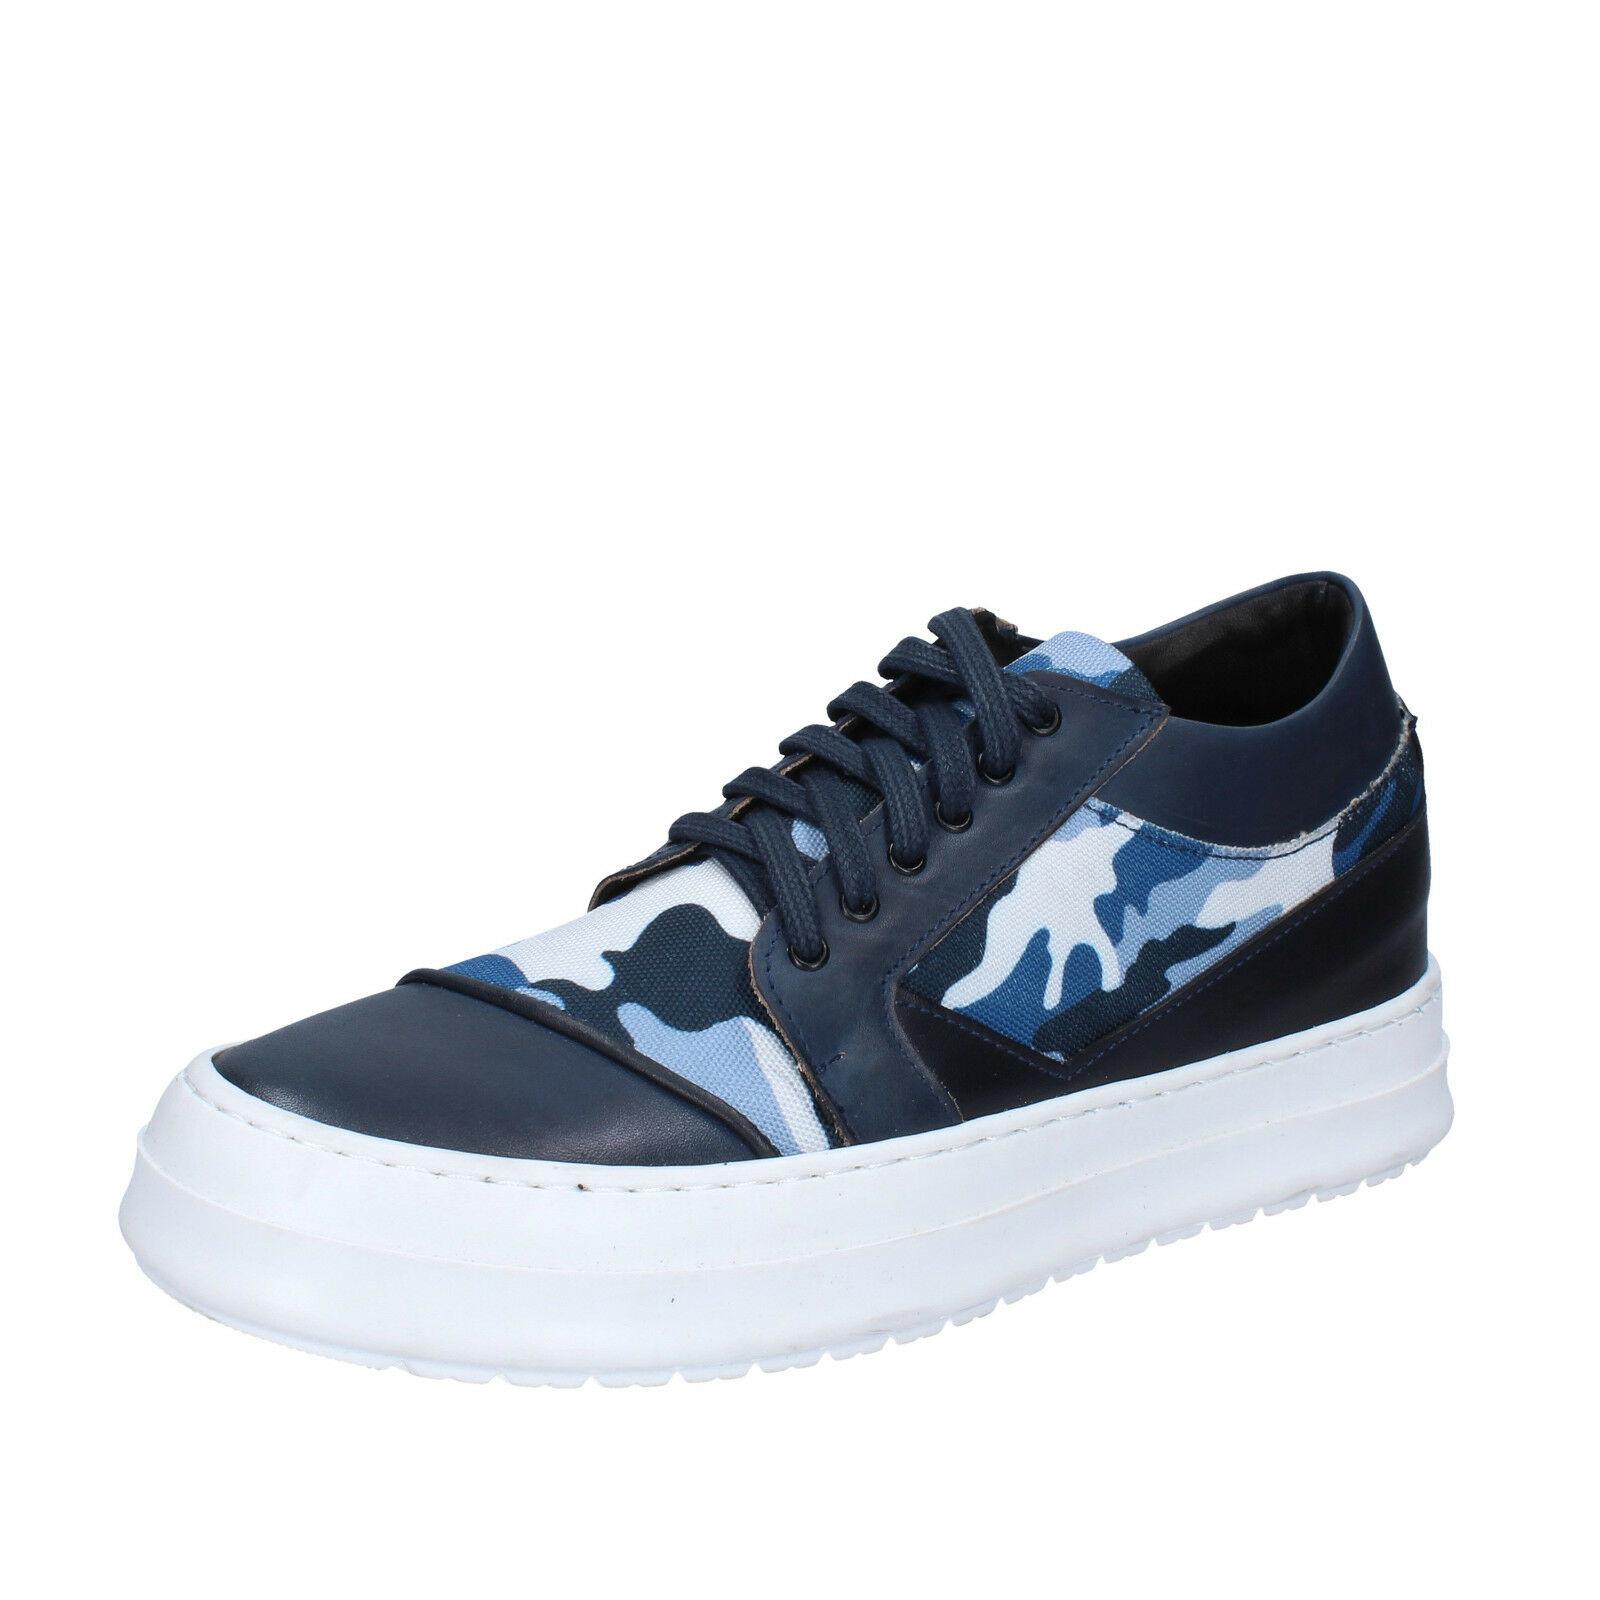 Men's schuhe FDF Leder Schuhe 8 (EU 41) Turnschuhe Blau Leder FDF textile BZ377-C 07a9ab